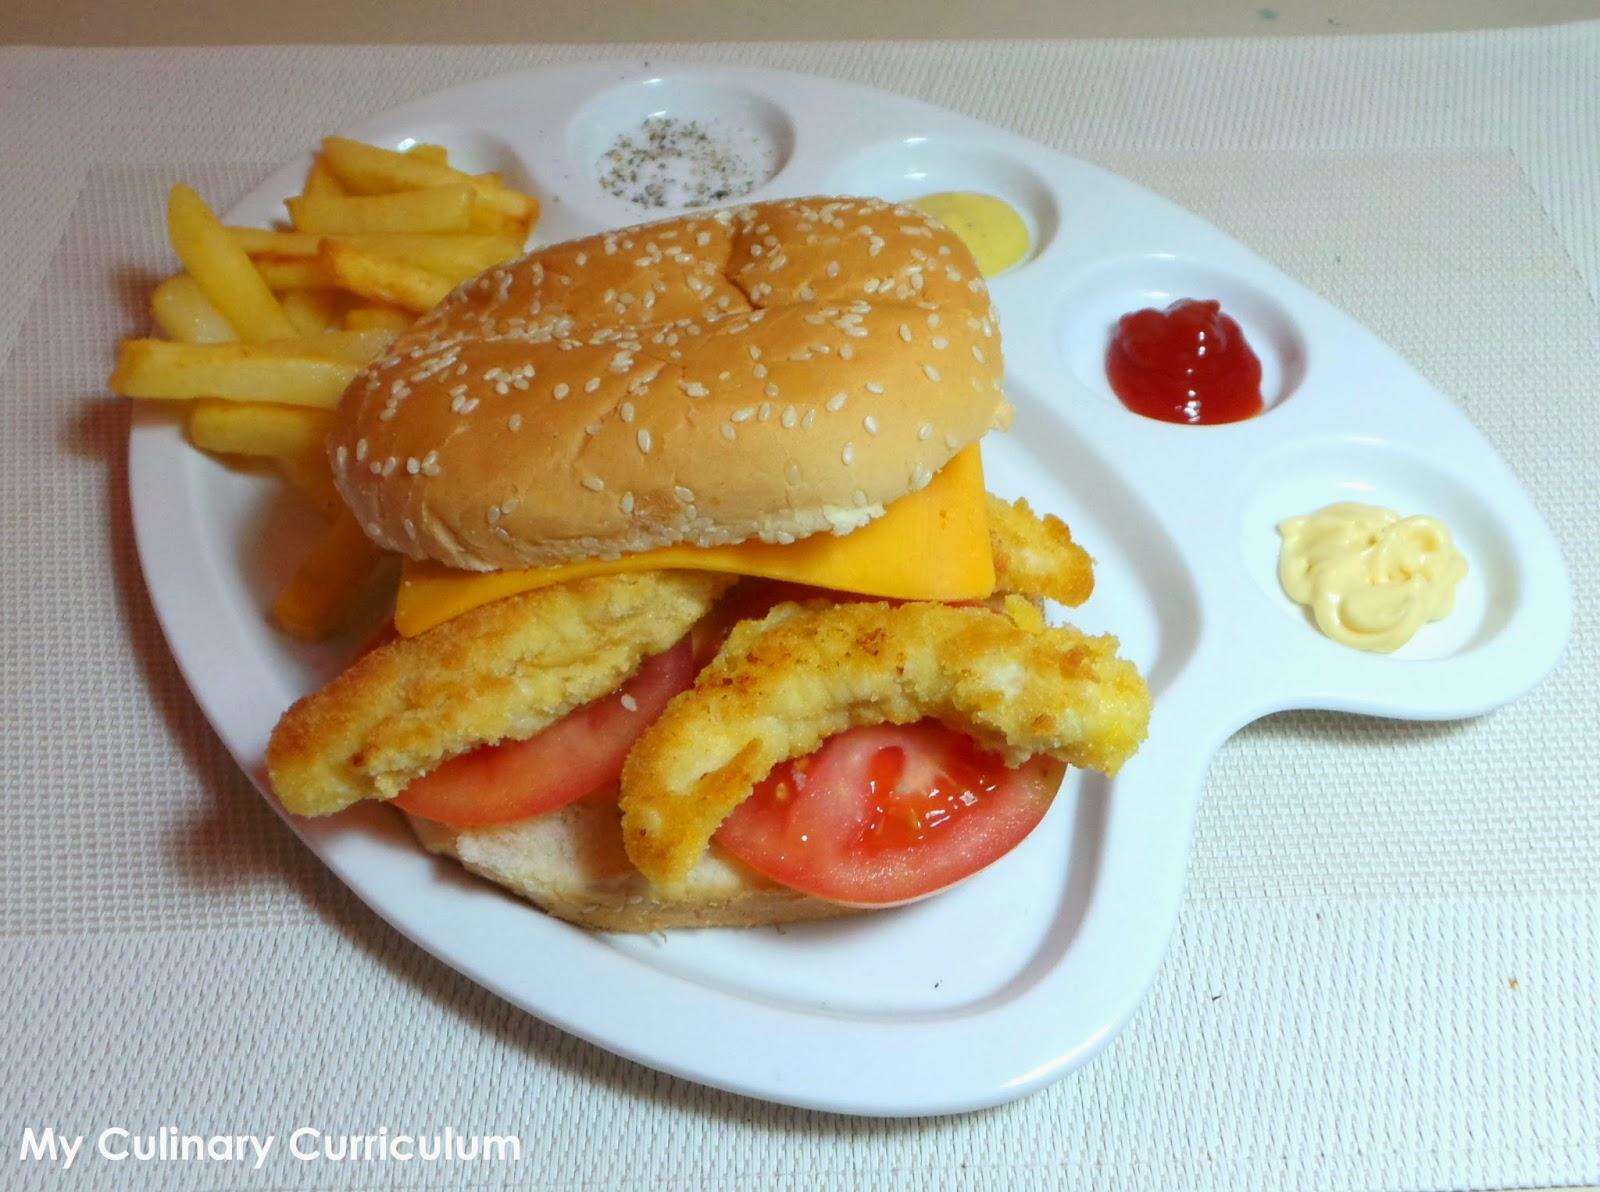 my culinary curriculum burger de poulet pan maison homemade breaded chicken burger. Black Bedroom Furniture Sets. Home Design Ideas